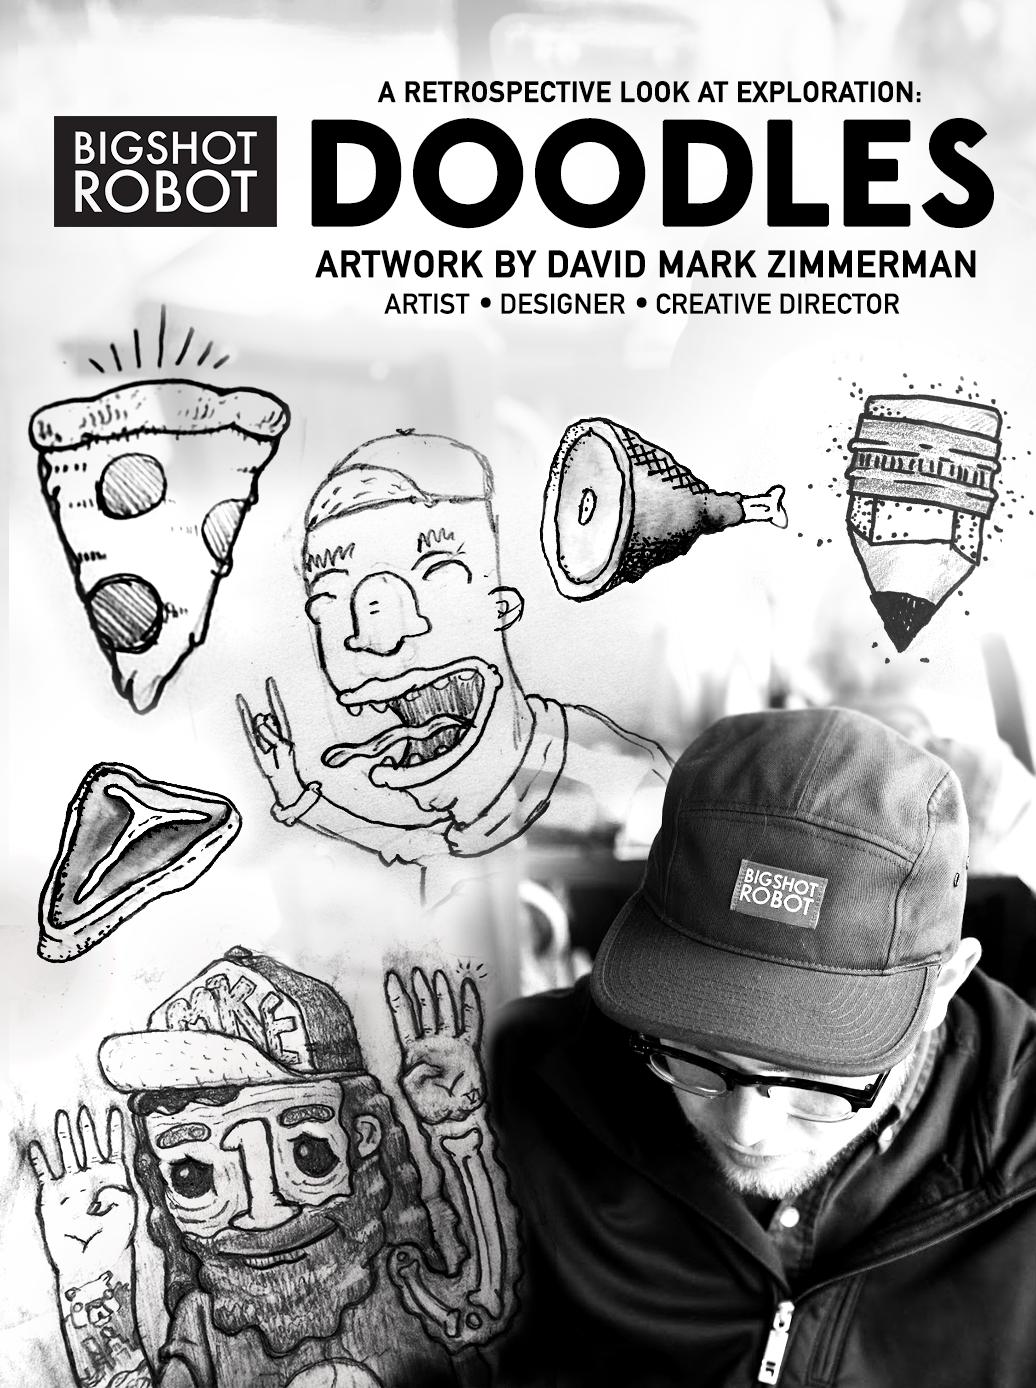 DoodlePoster